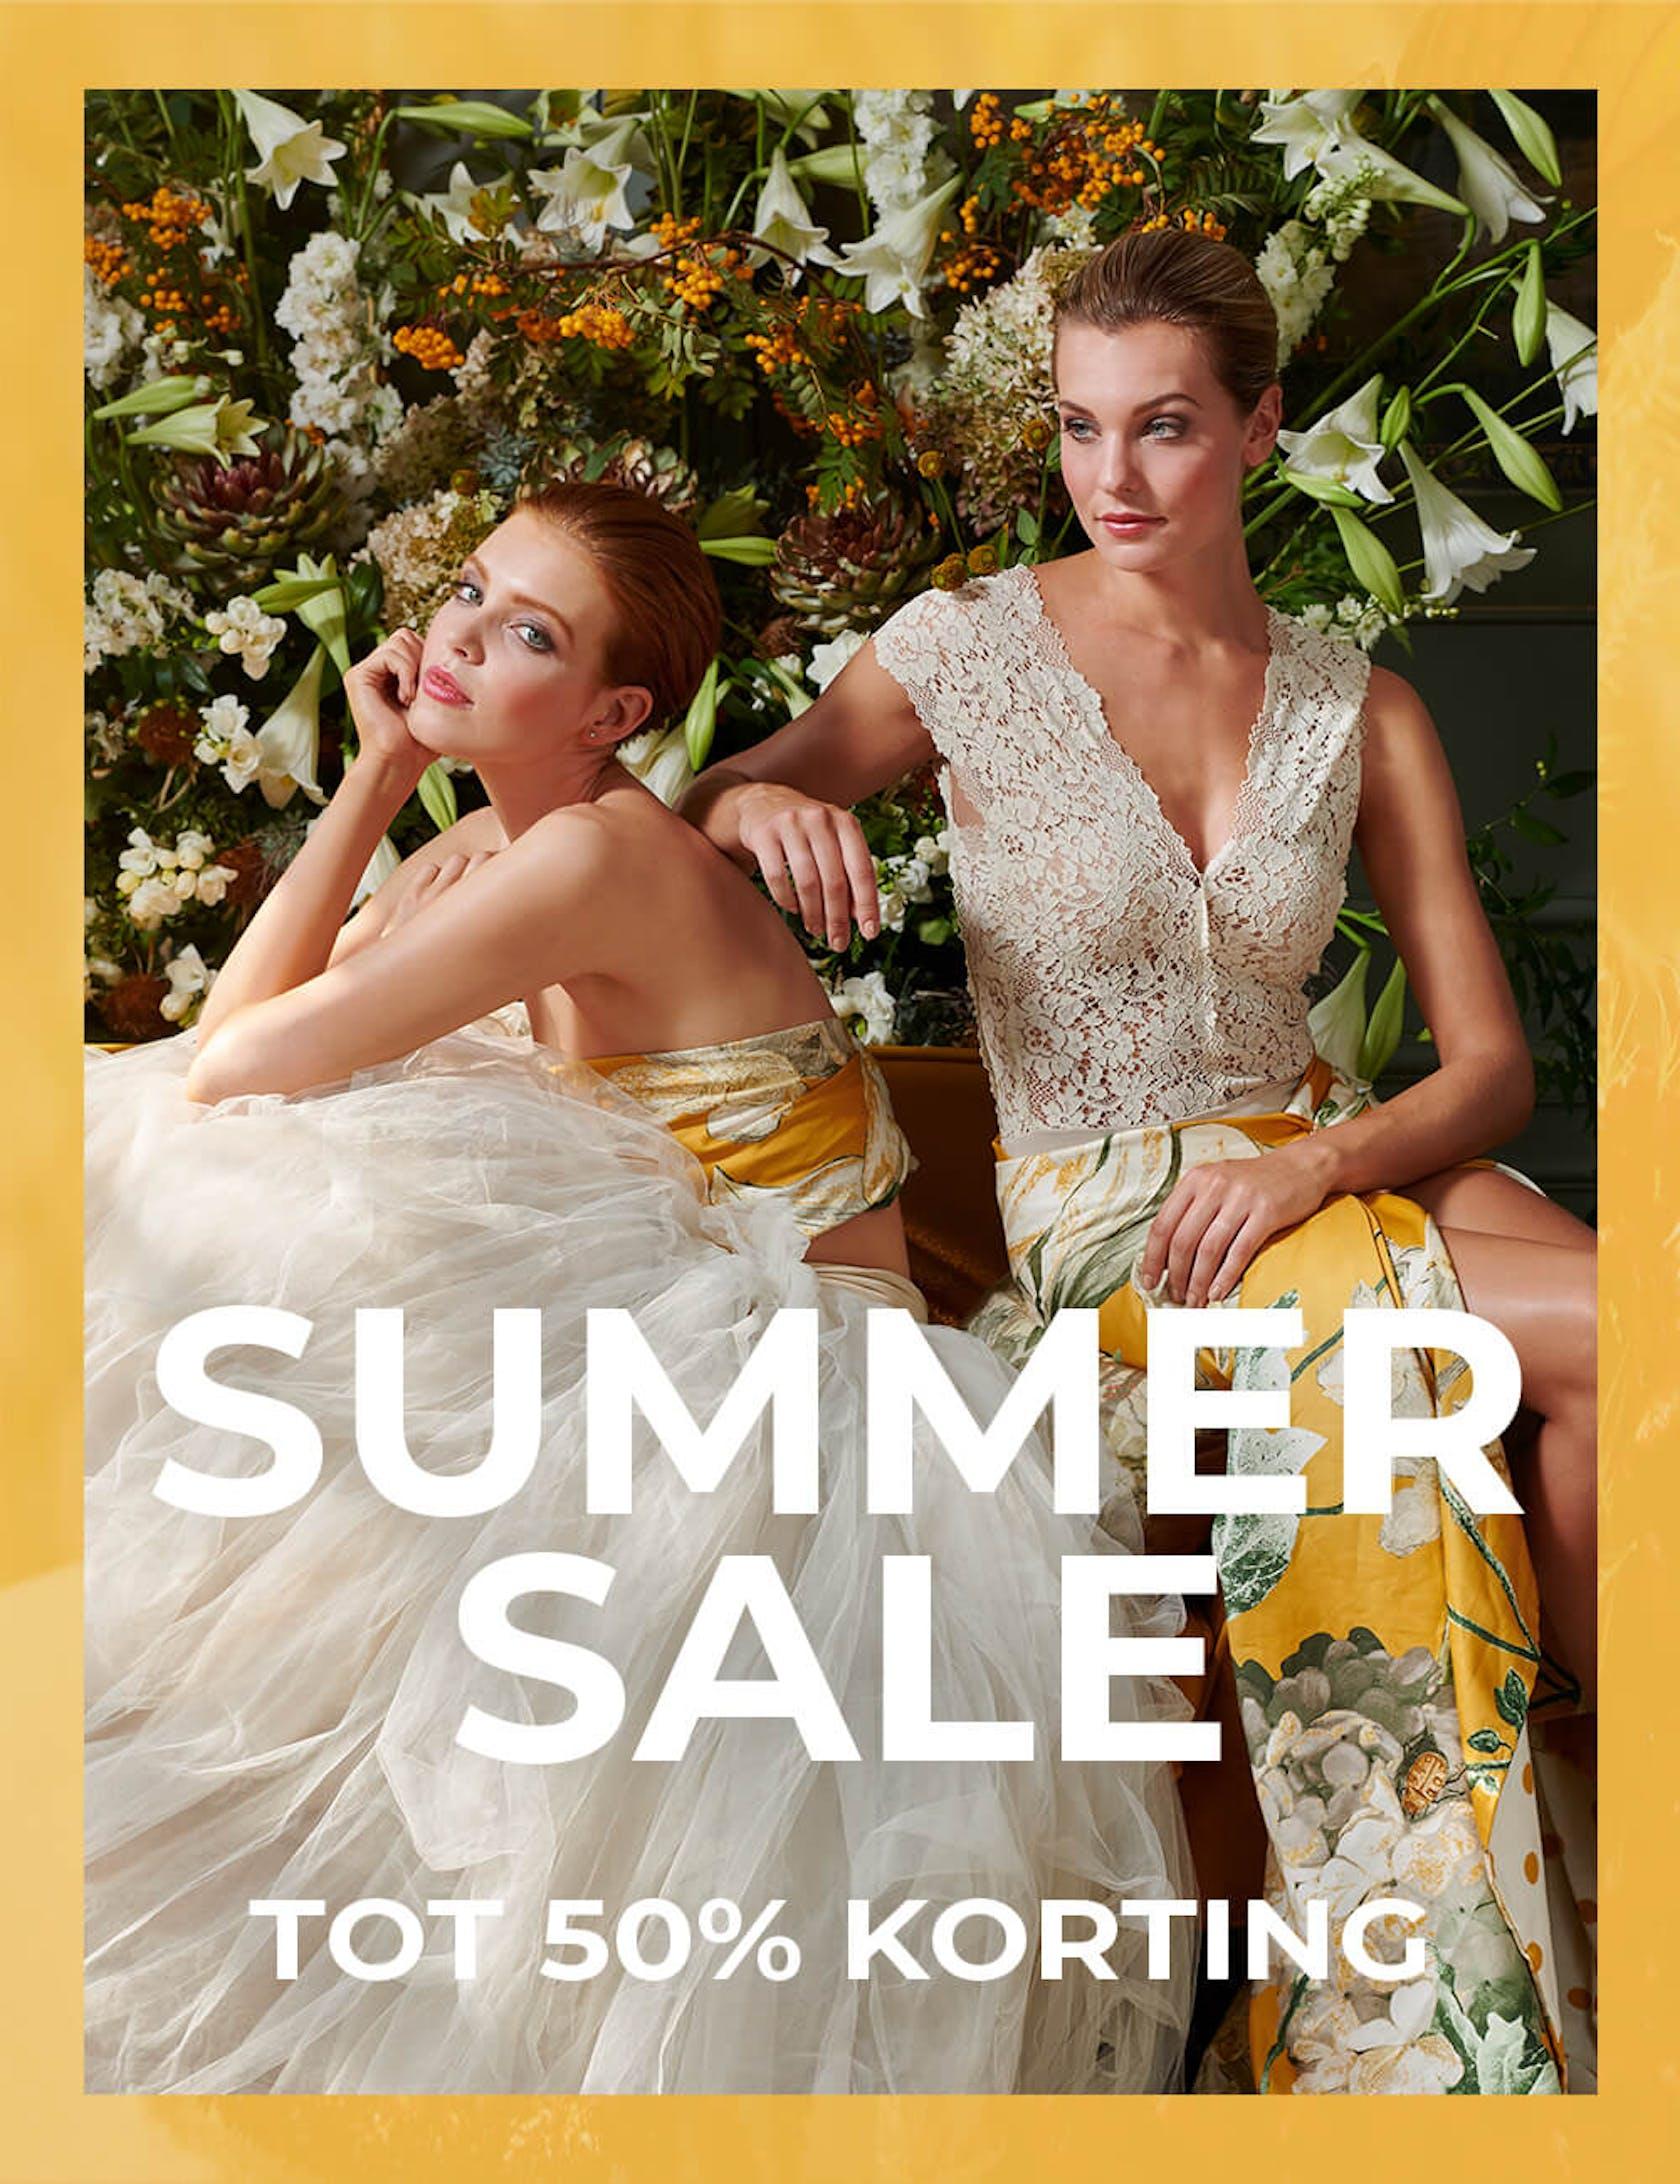 ESSENZA HOME - Summer Sale - tot 50% korting!